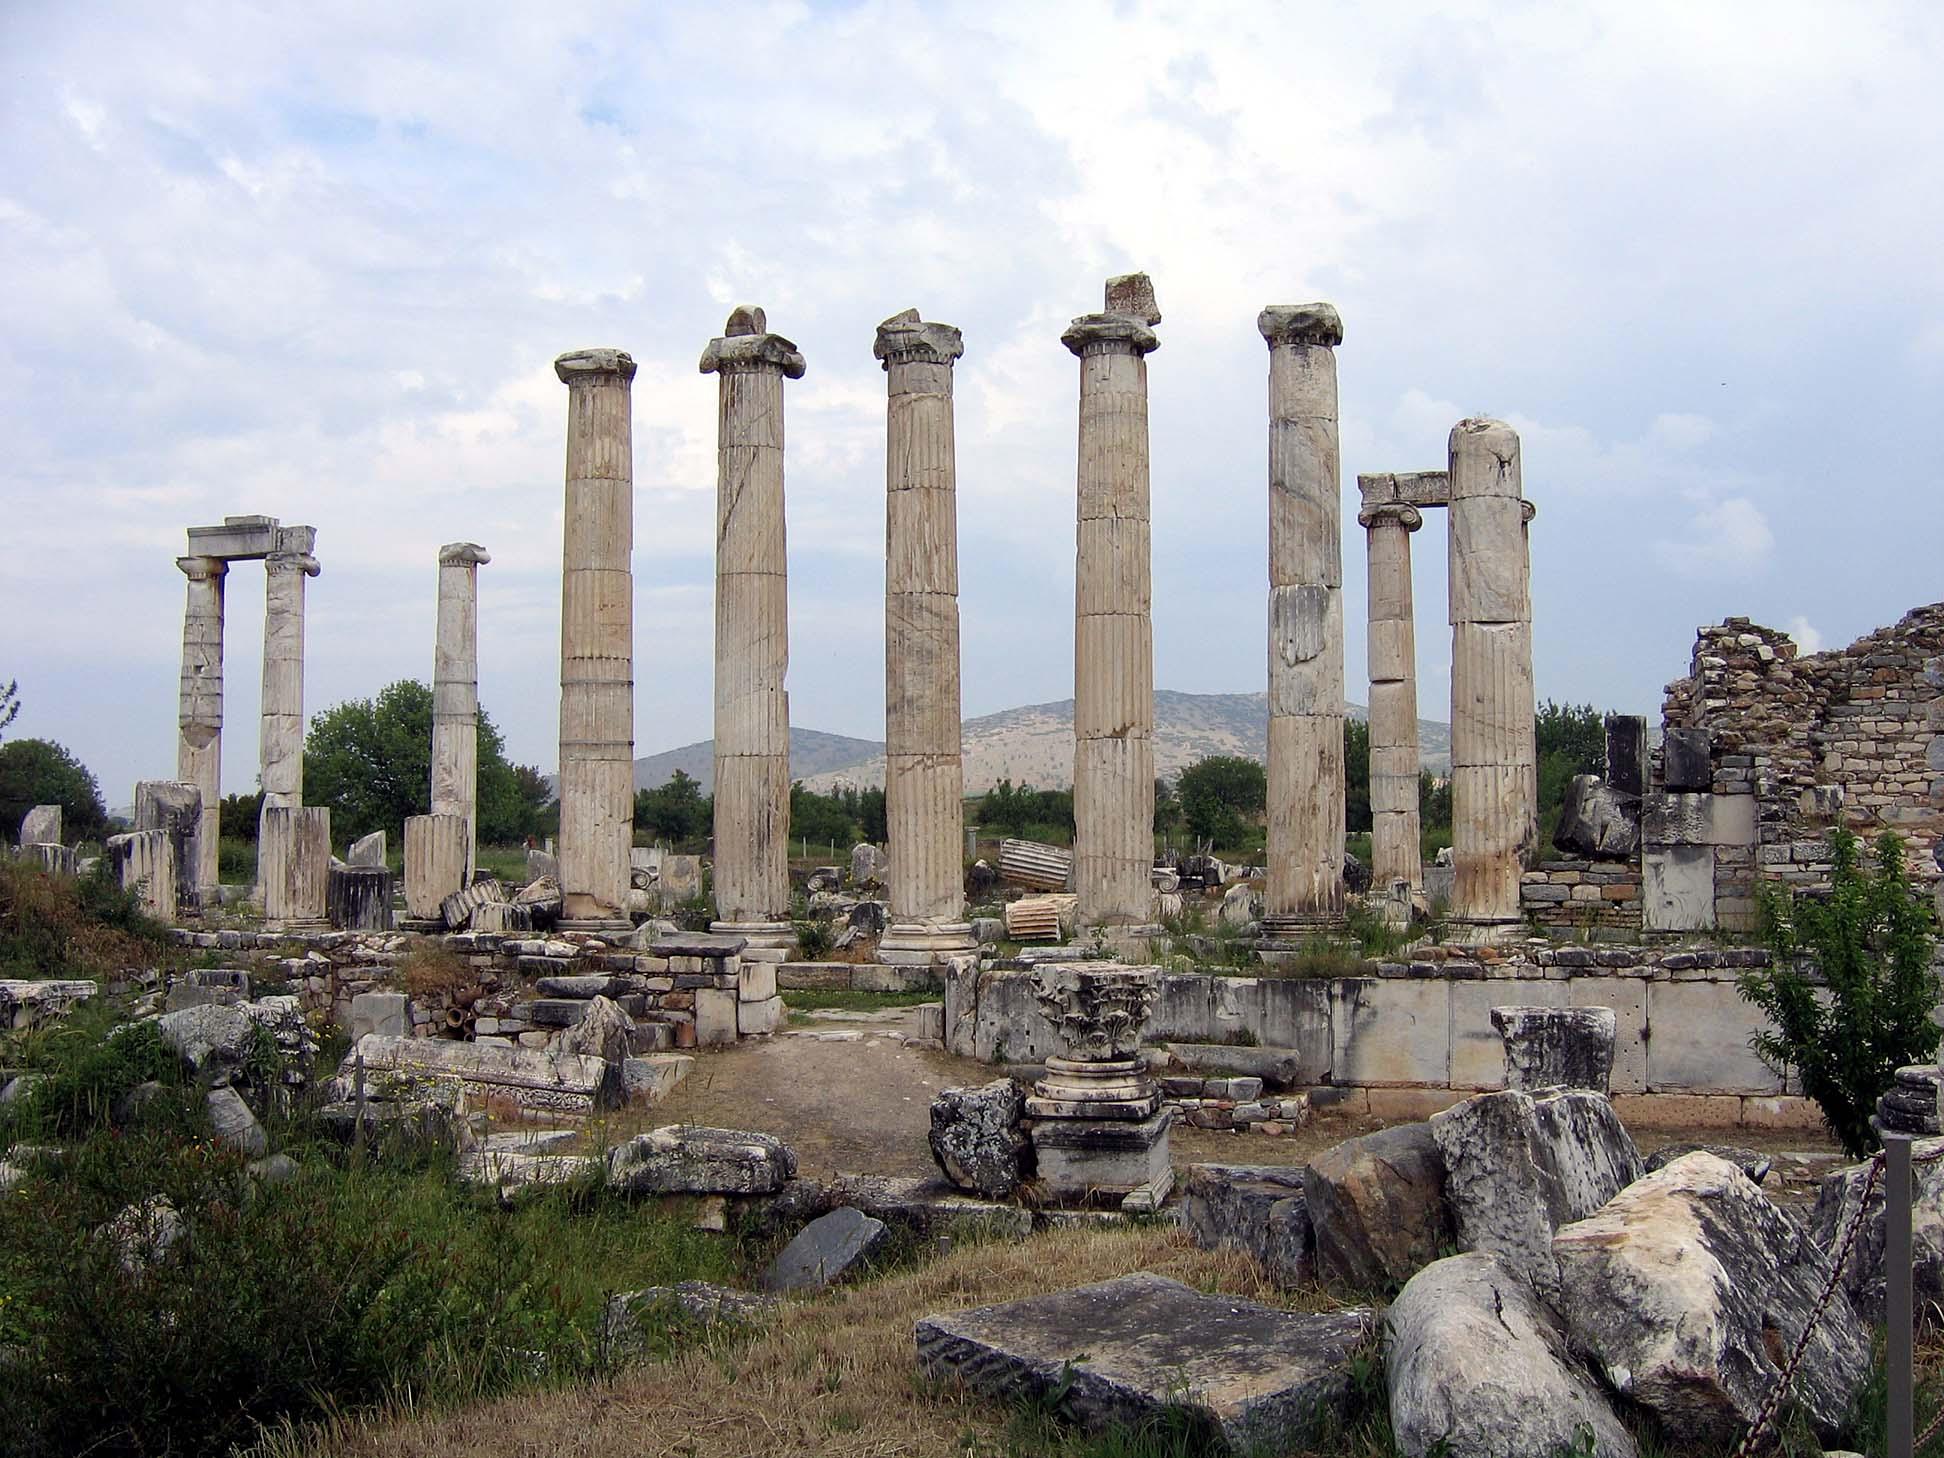 File:Aphrodisias temple22.jpg - Wikipedia